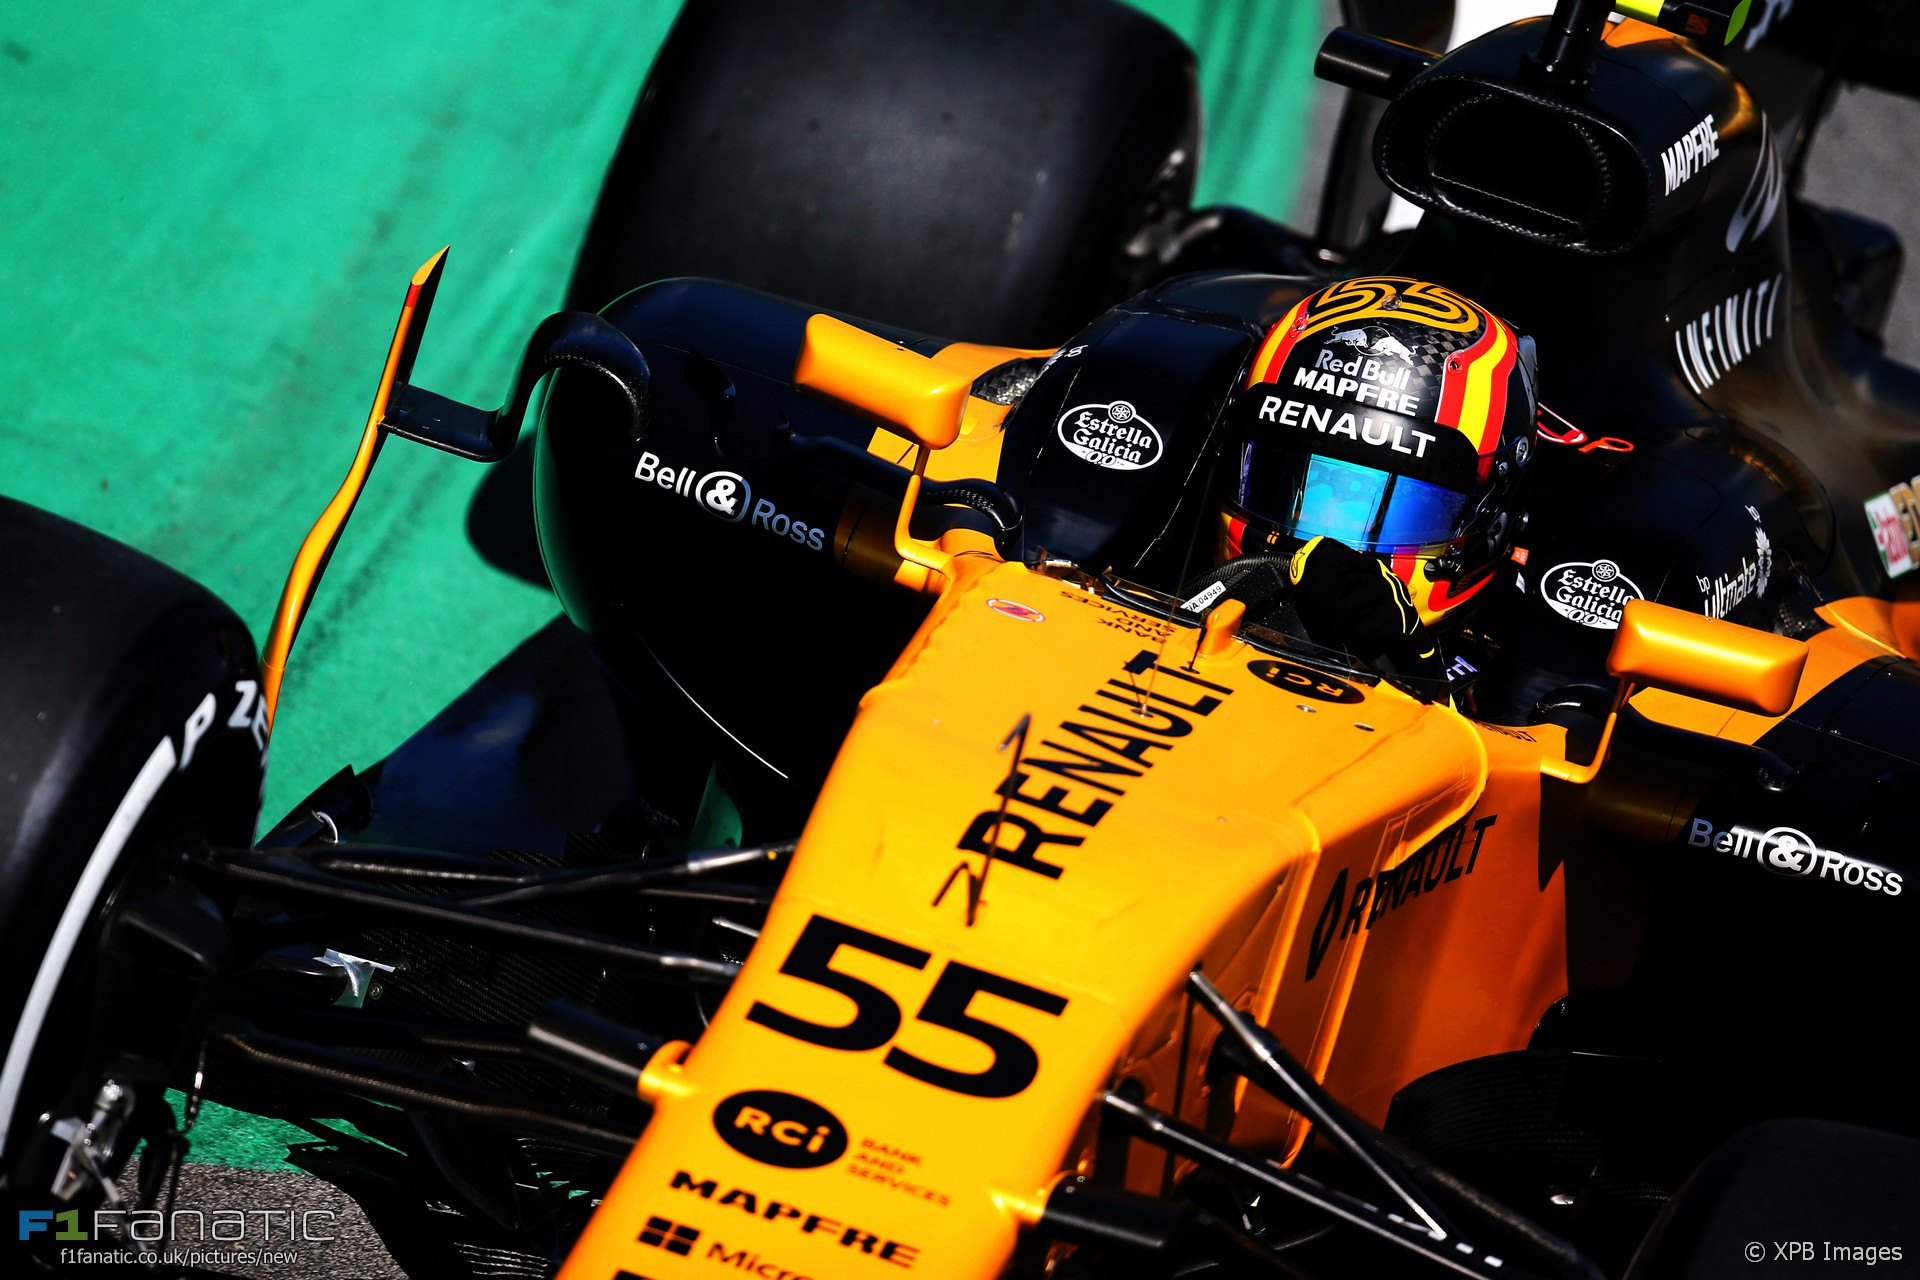 Carlos Sainz Jnr, Renault, Interlagos, 2017